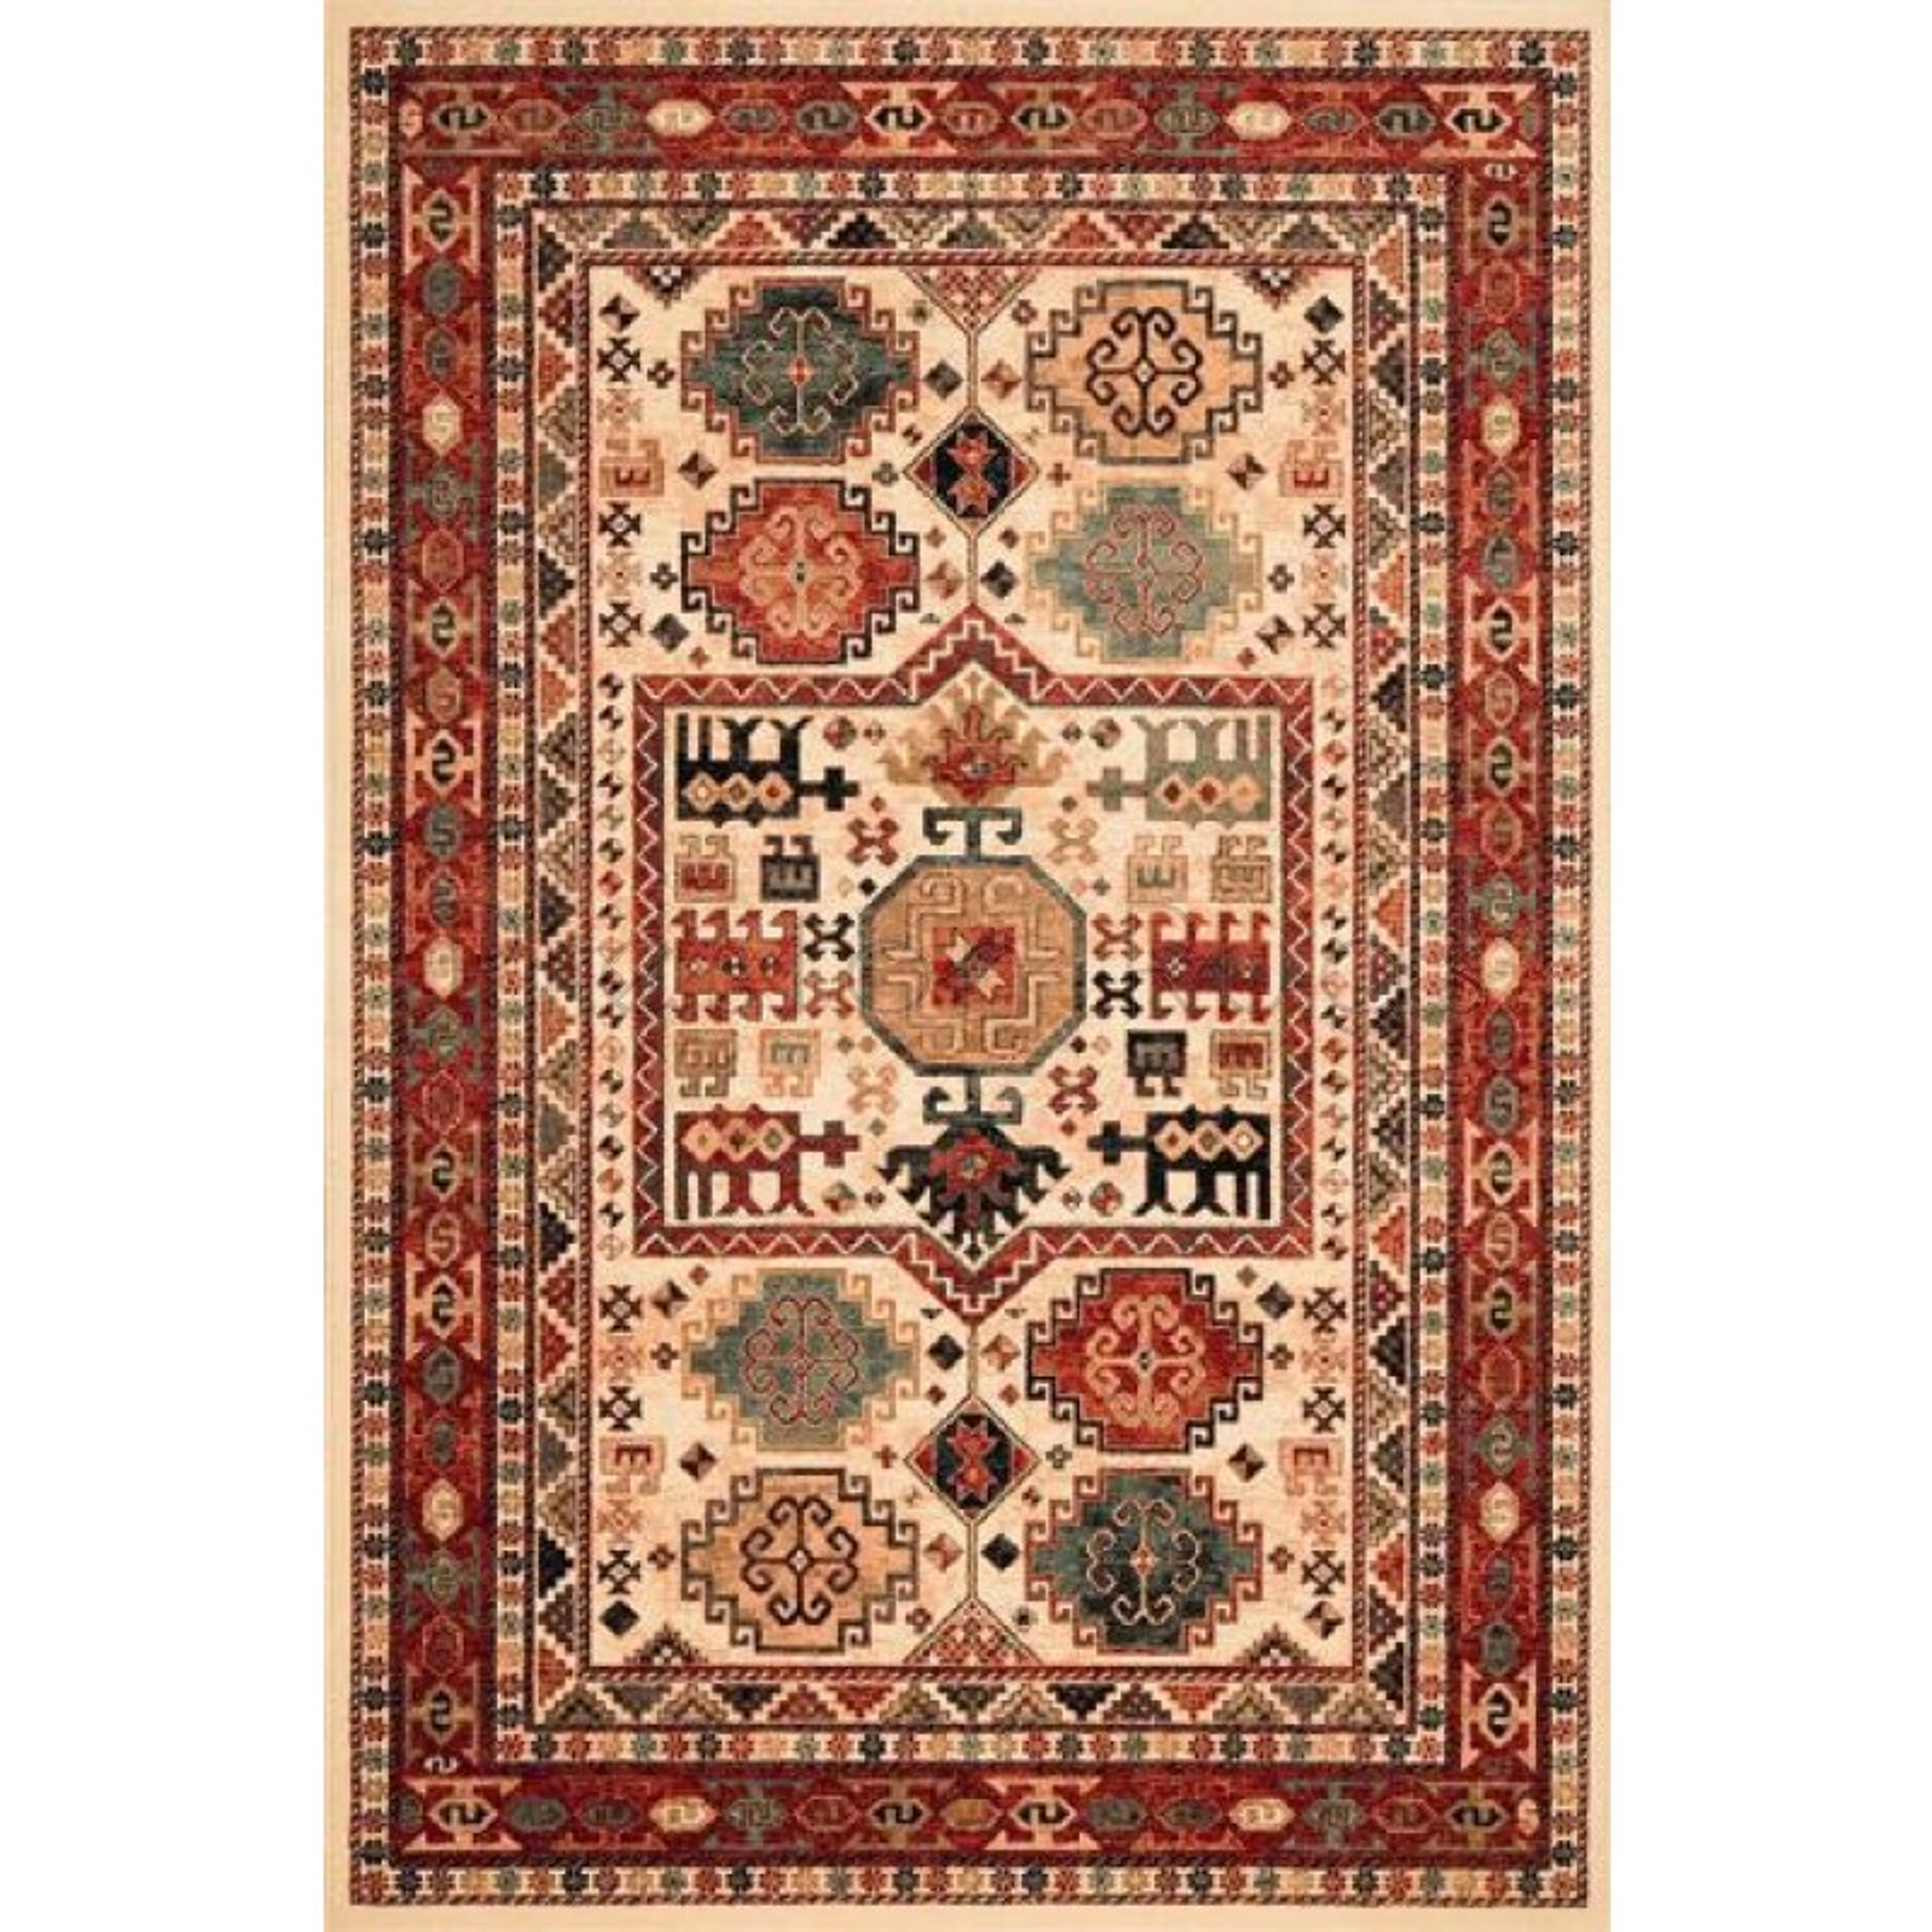 Kashqai Traditional Persian Design Rug 4306 100 240 X